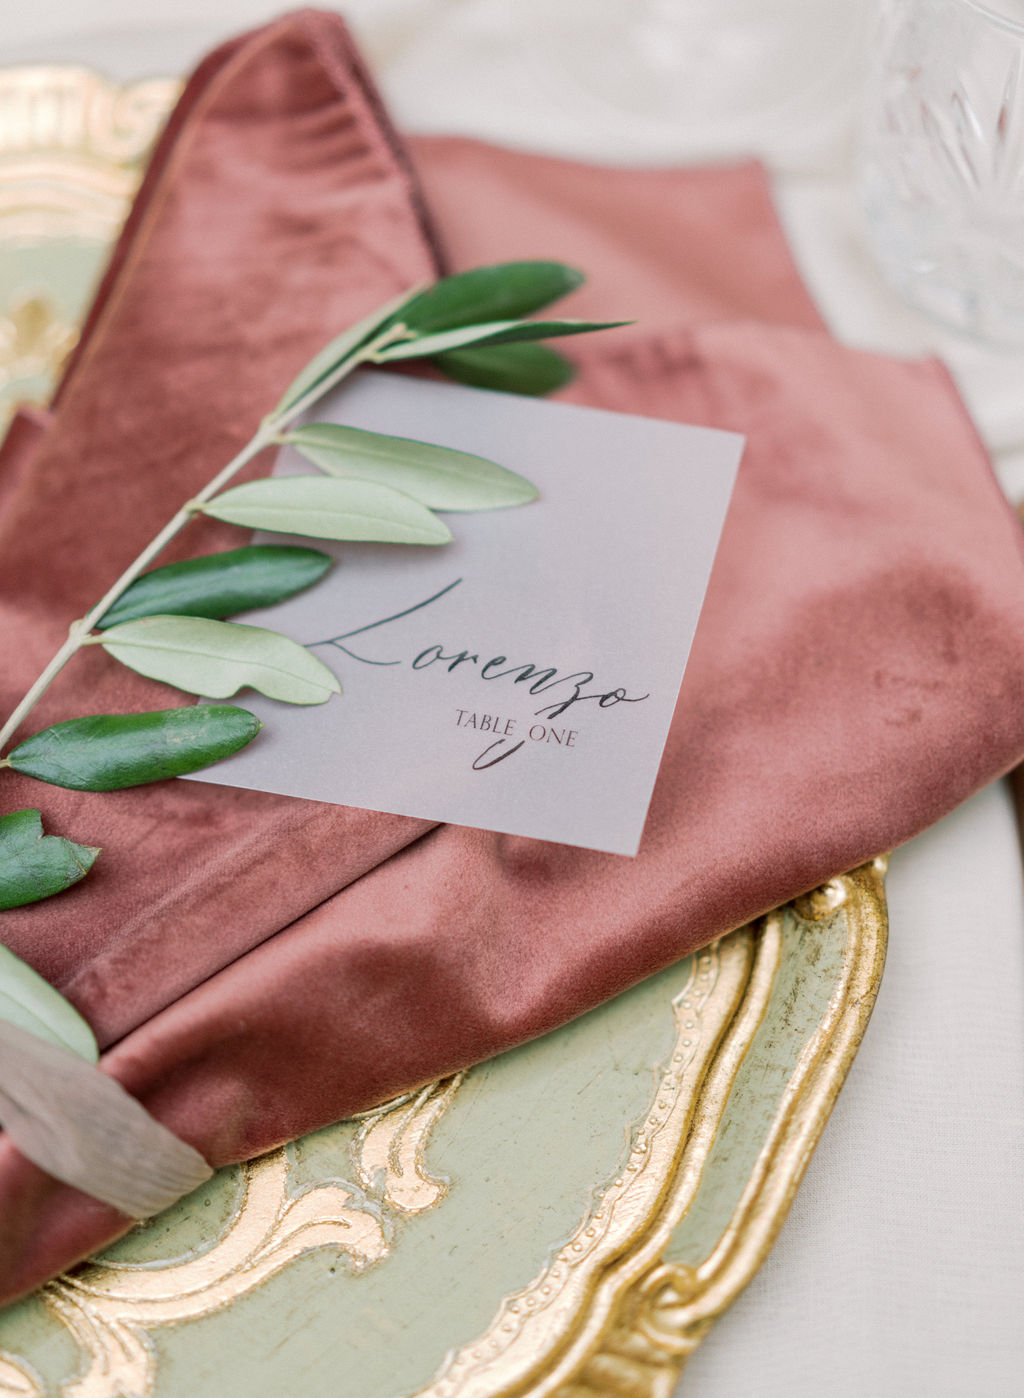 artiese-ago-wedding-editorial-06640.jpg